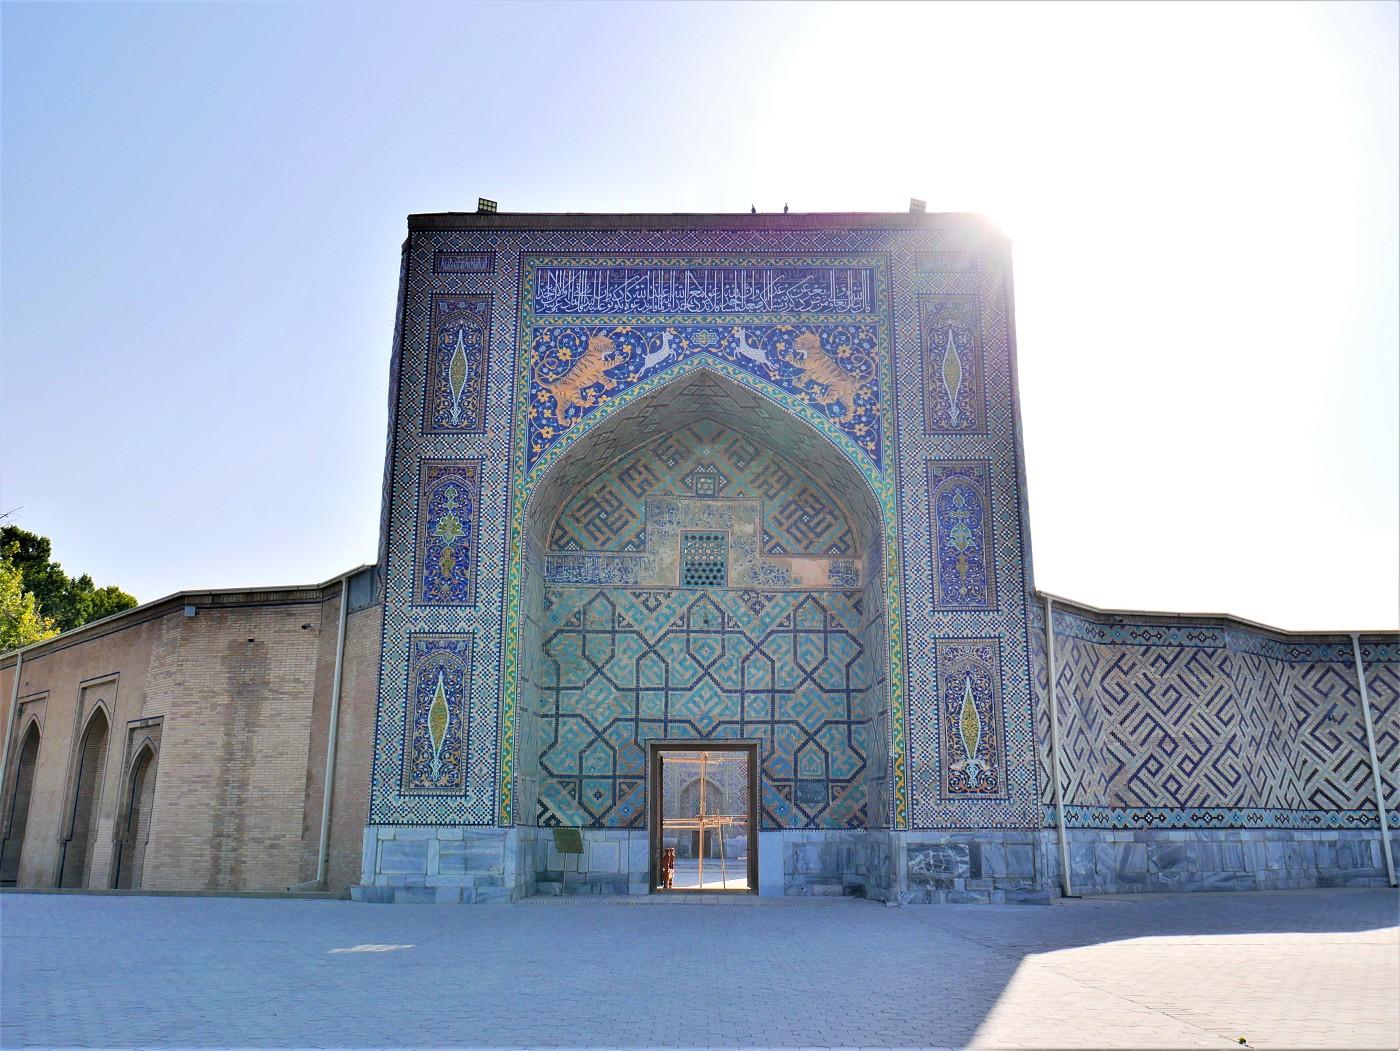 1 Xoja Ahror Complex + Nadir Divan-Begi Madrasah in Samarkand